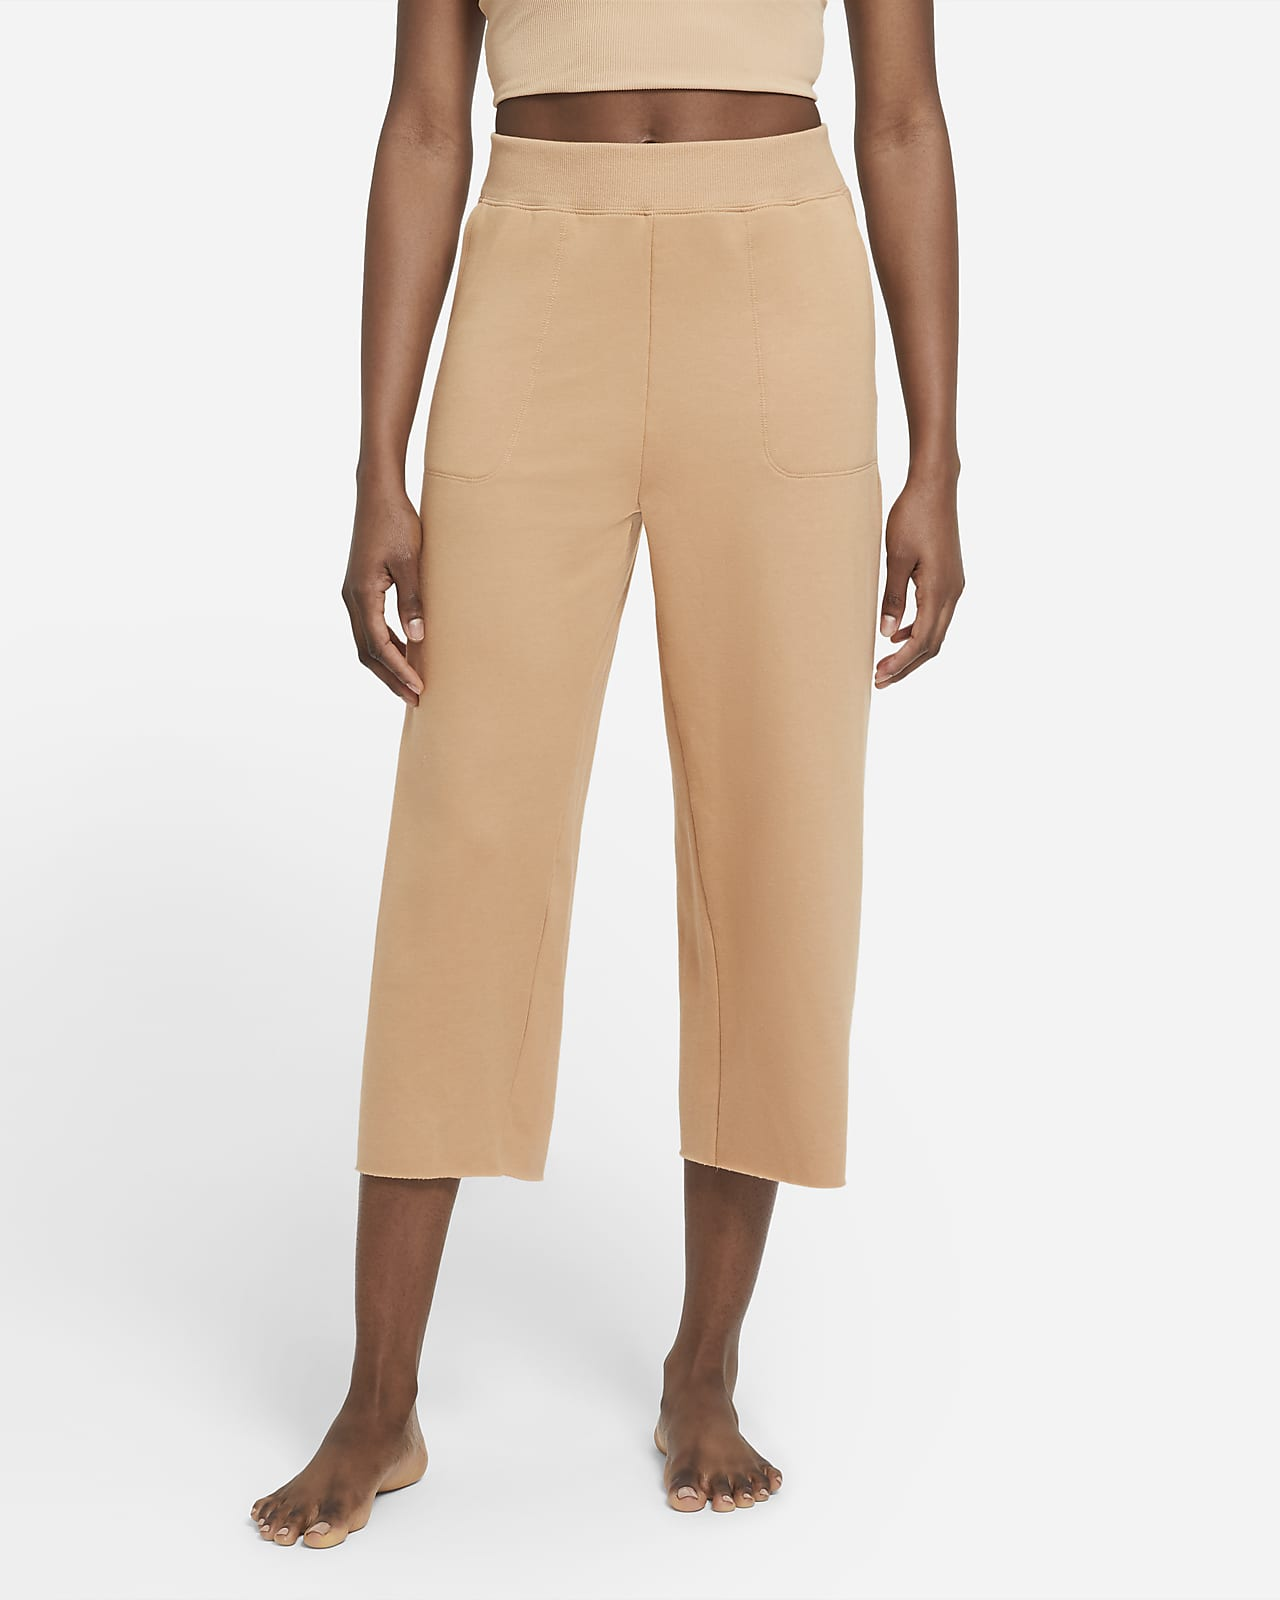 Pantalones Pescadores De Tejido Fleece Para Mujer Nike Yoga Luxe Nike Com